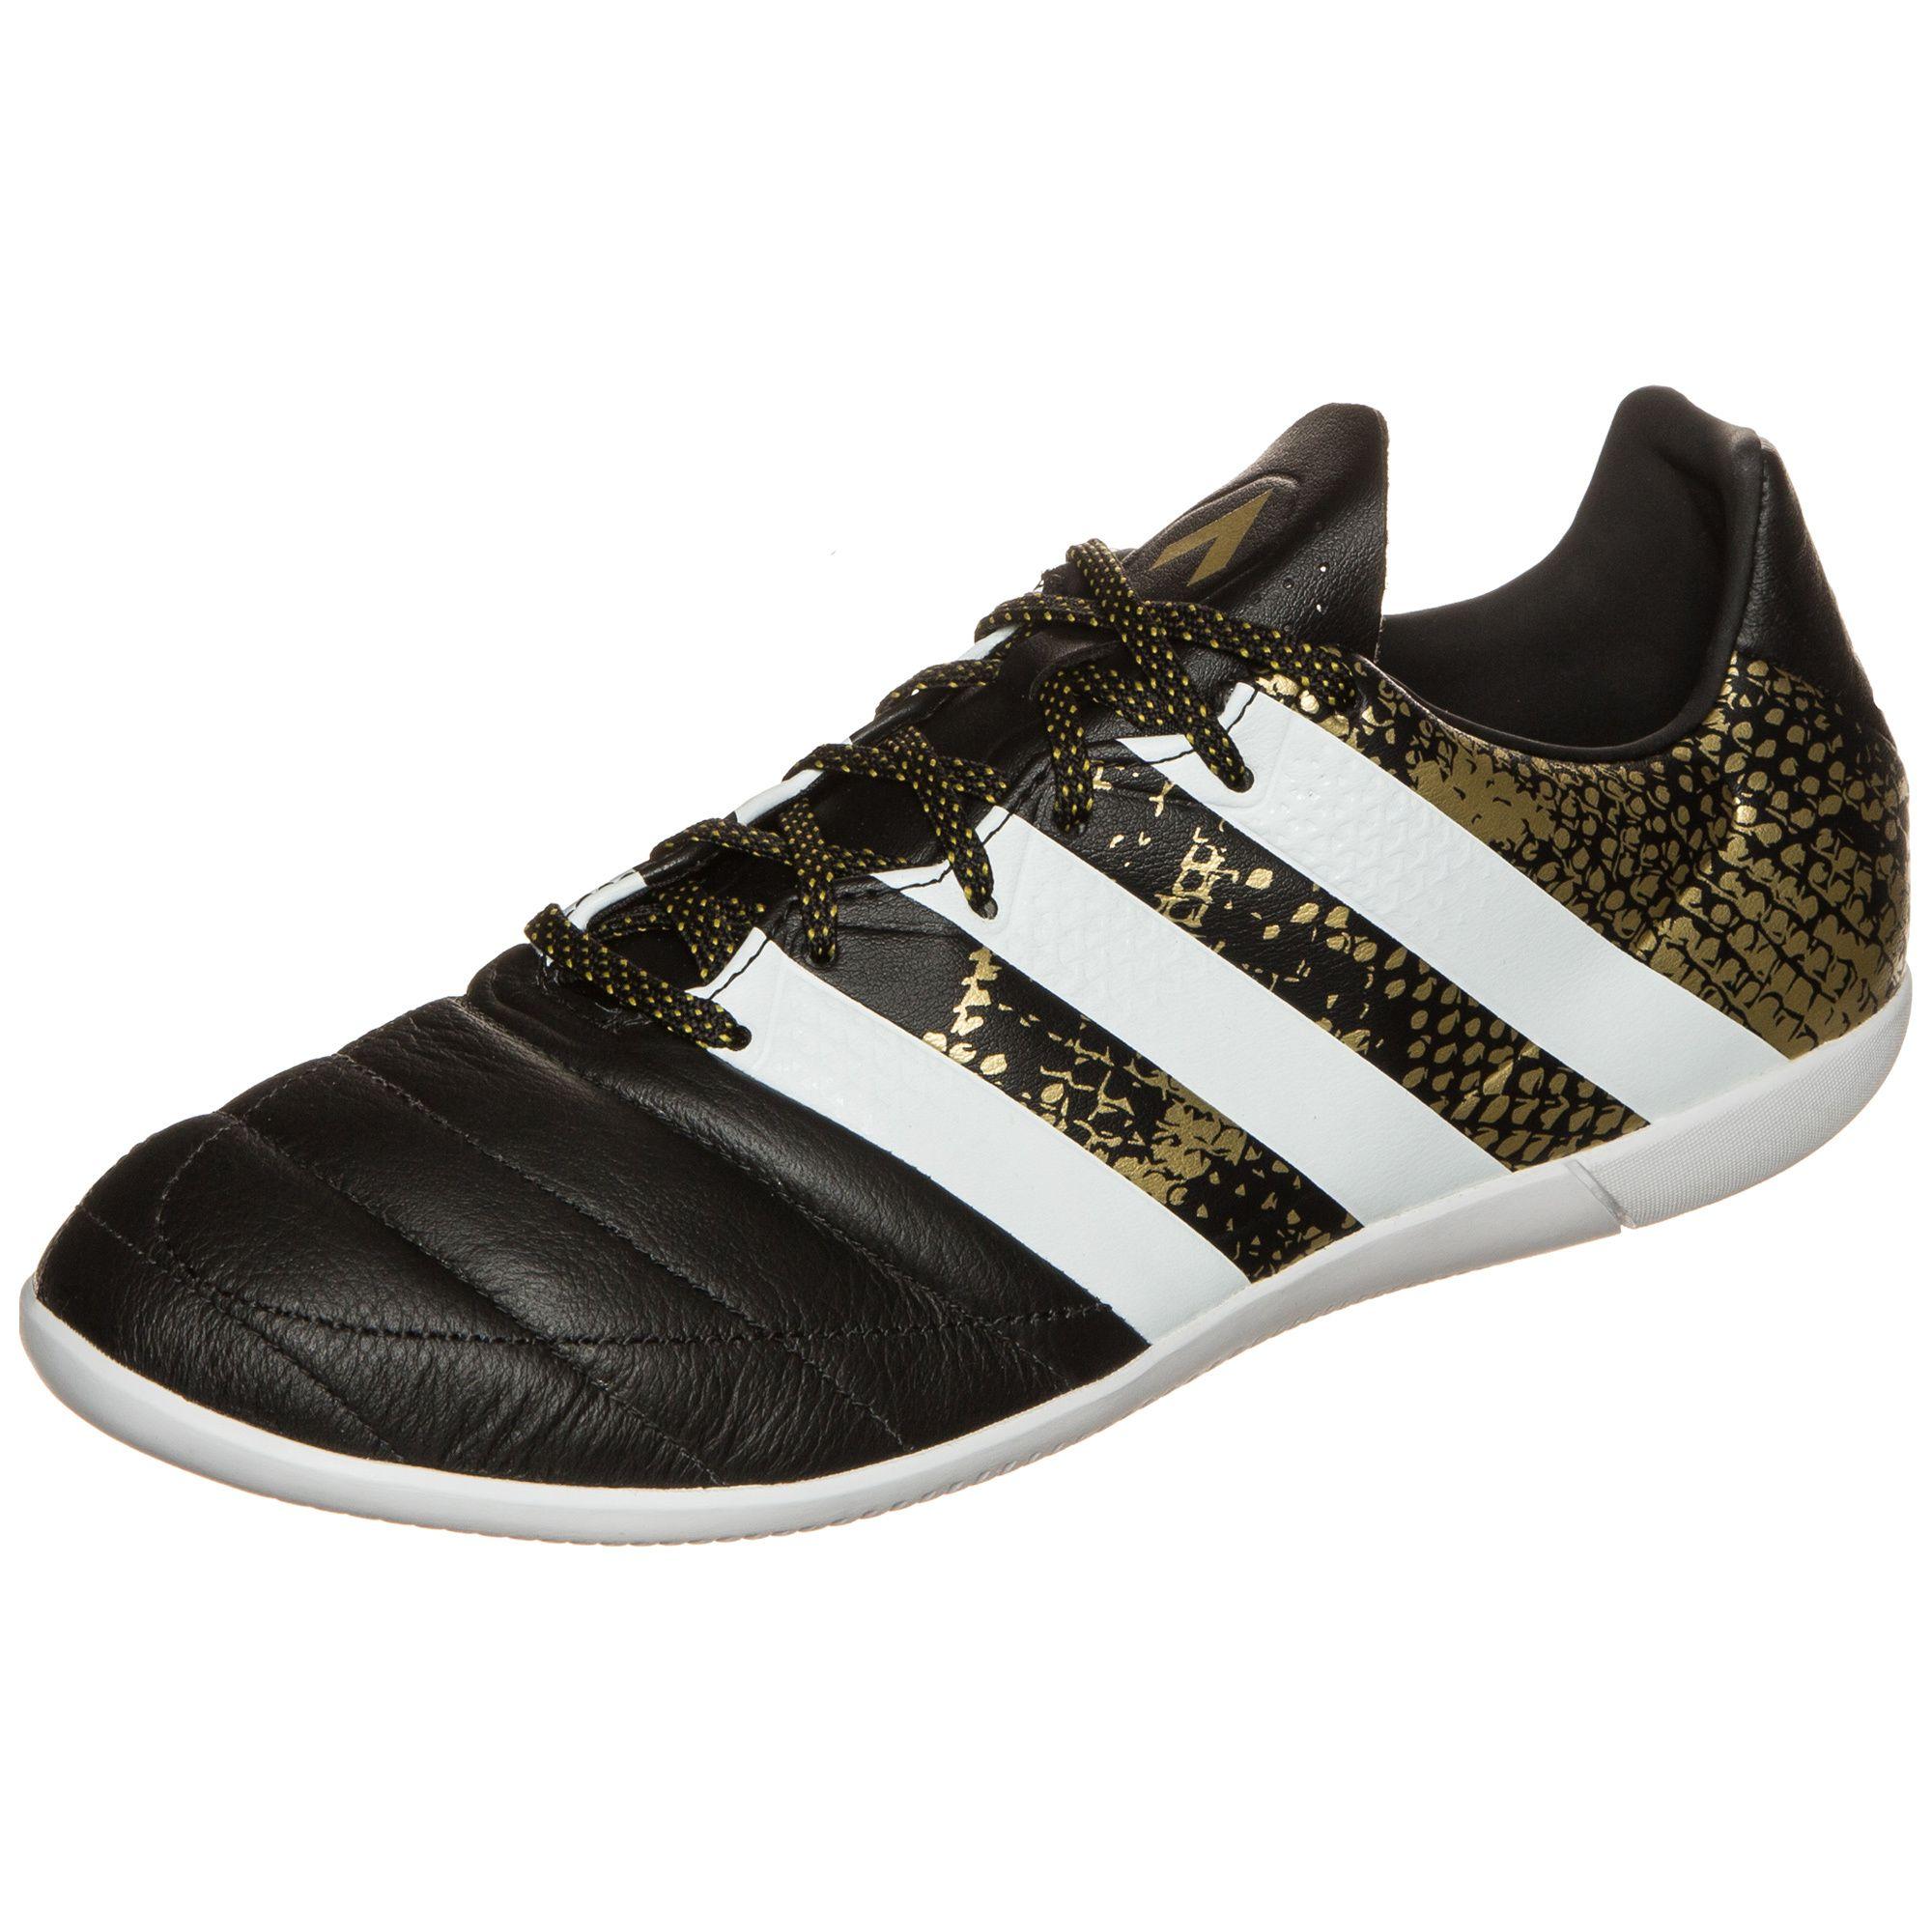 ADIDAS PERFORMANCE adidas Performance ACE 16.3 Indoor Leather Fußballschuh Herren